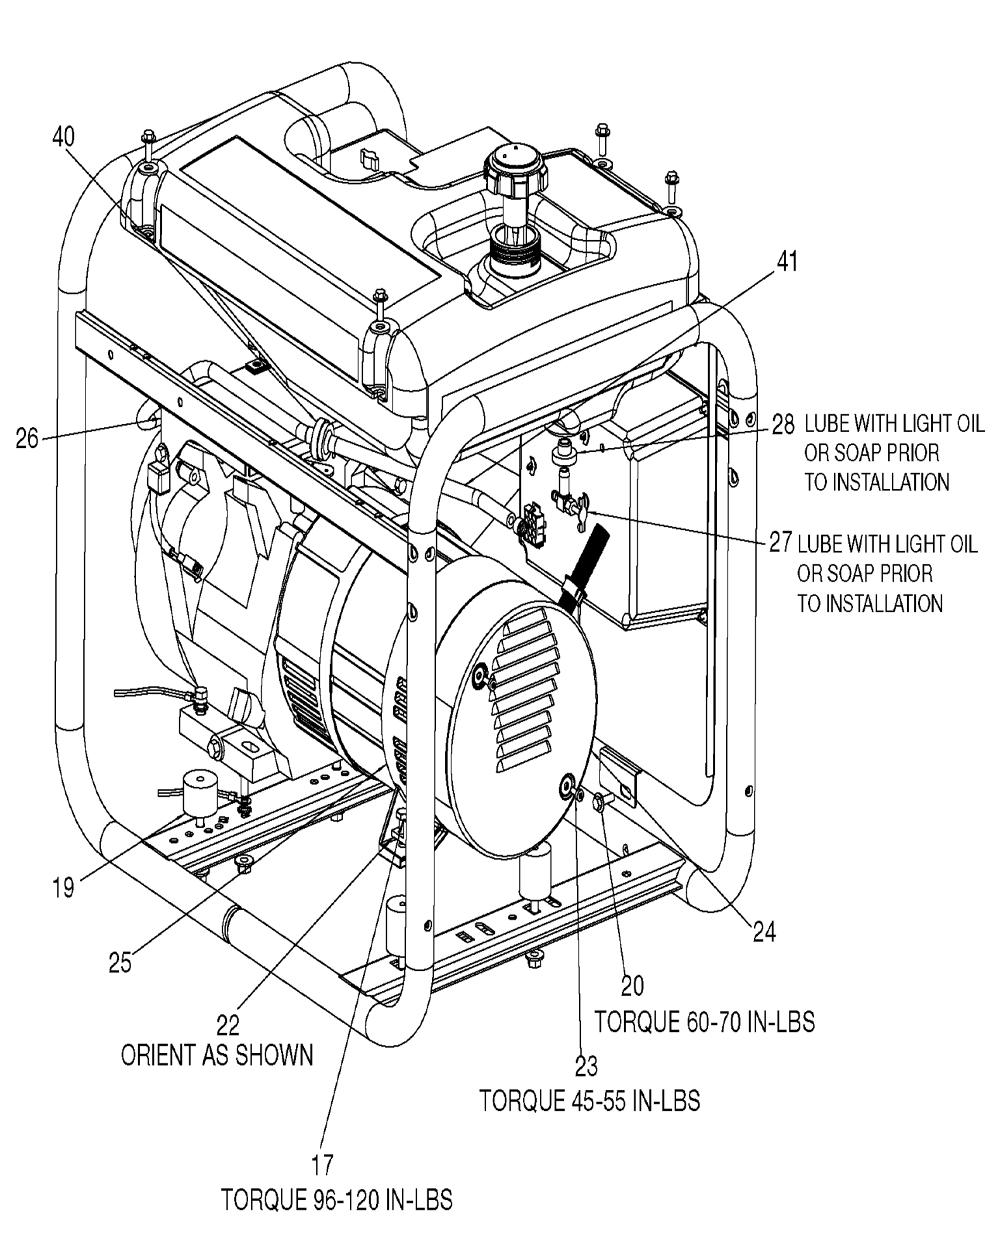 H451CS-W-portercable-T1-PB-5Break Down